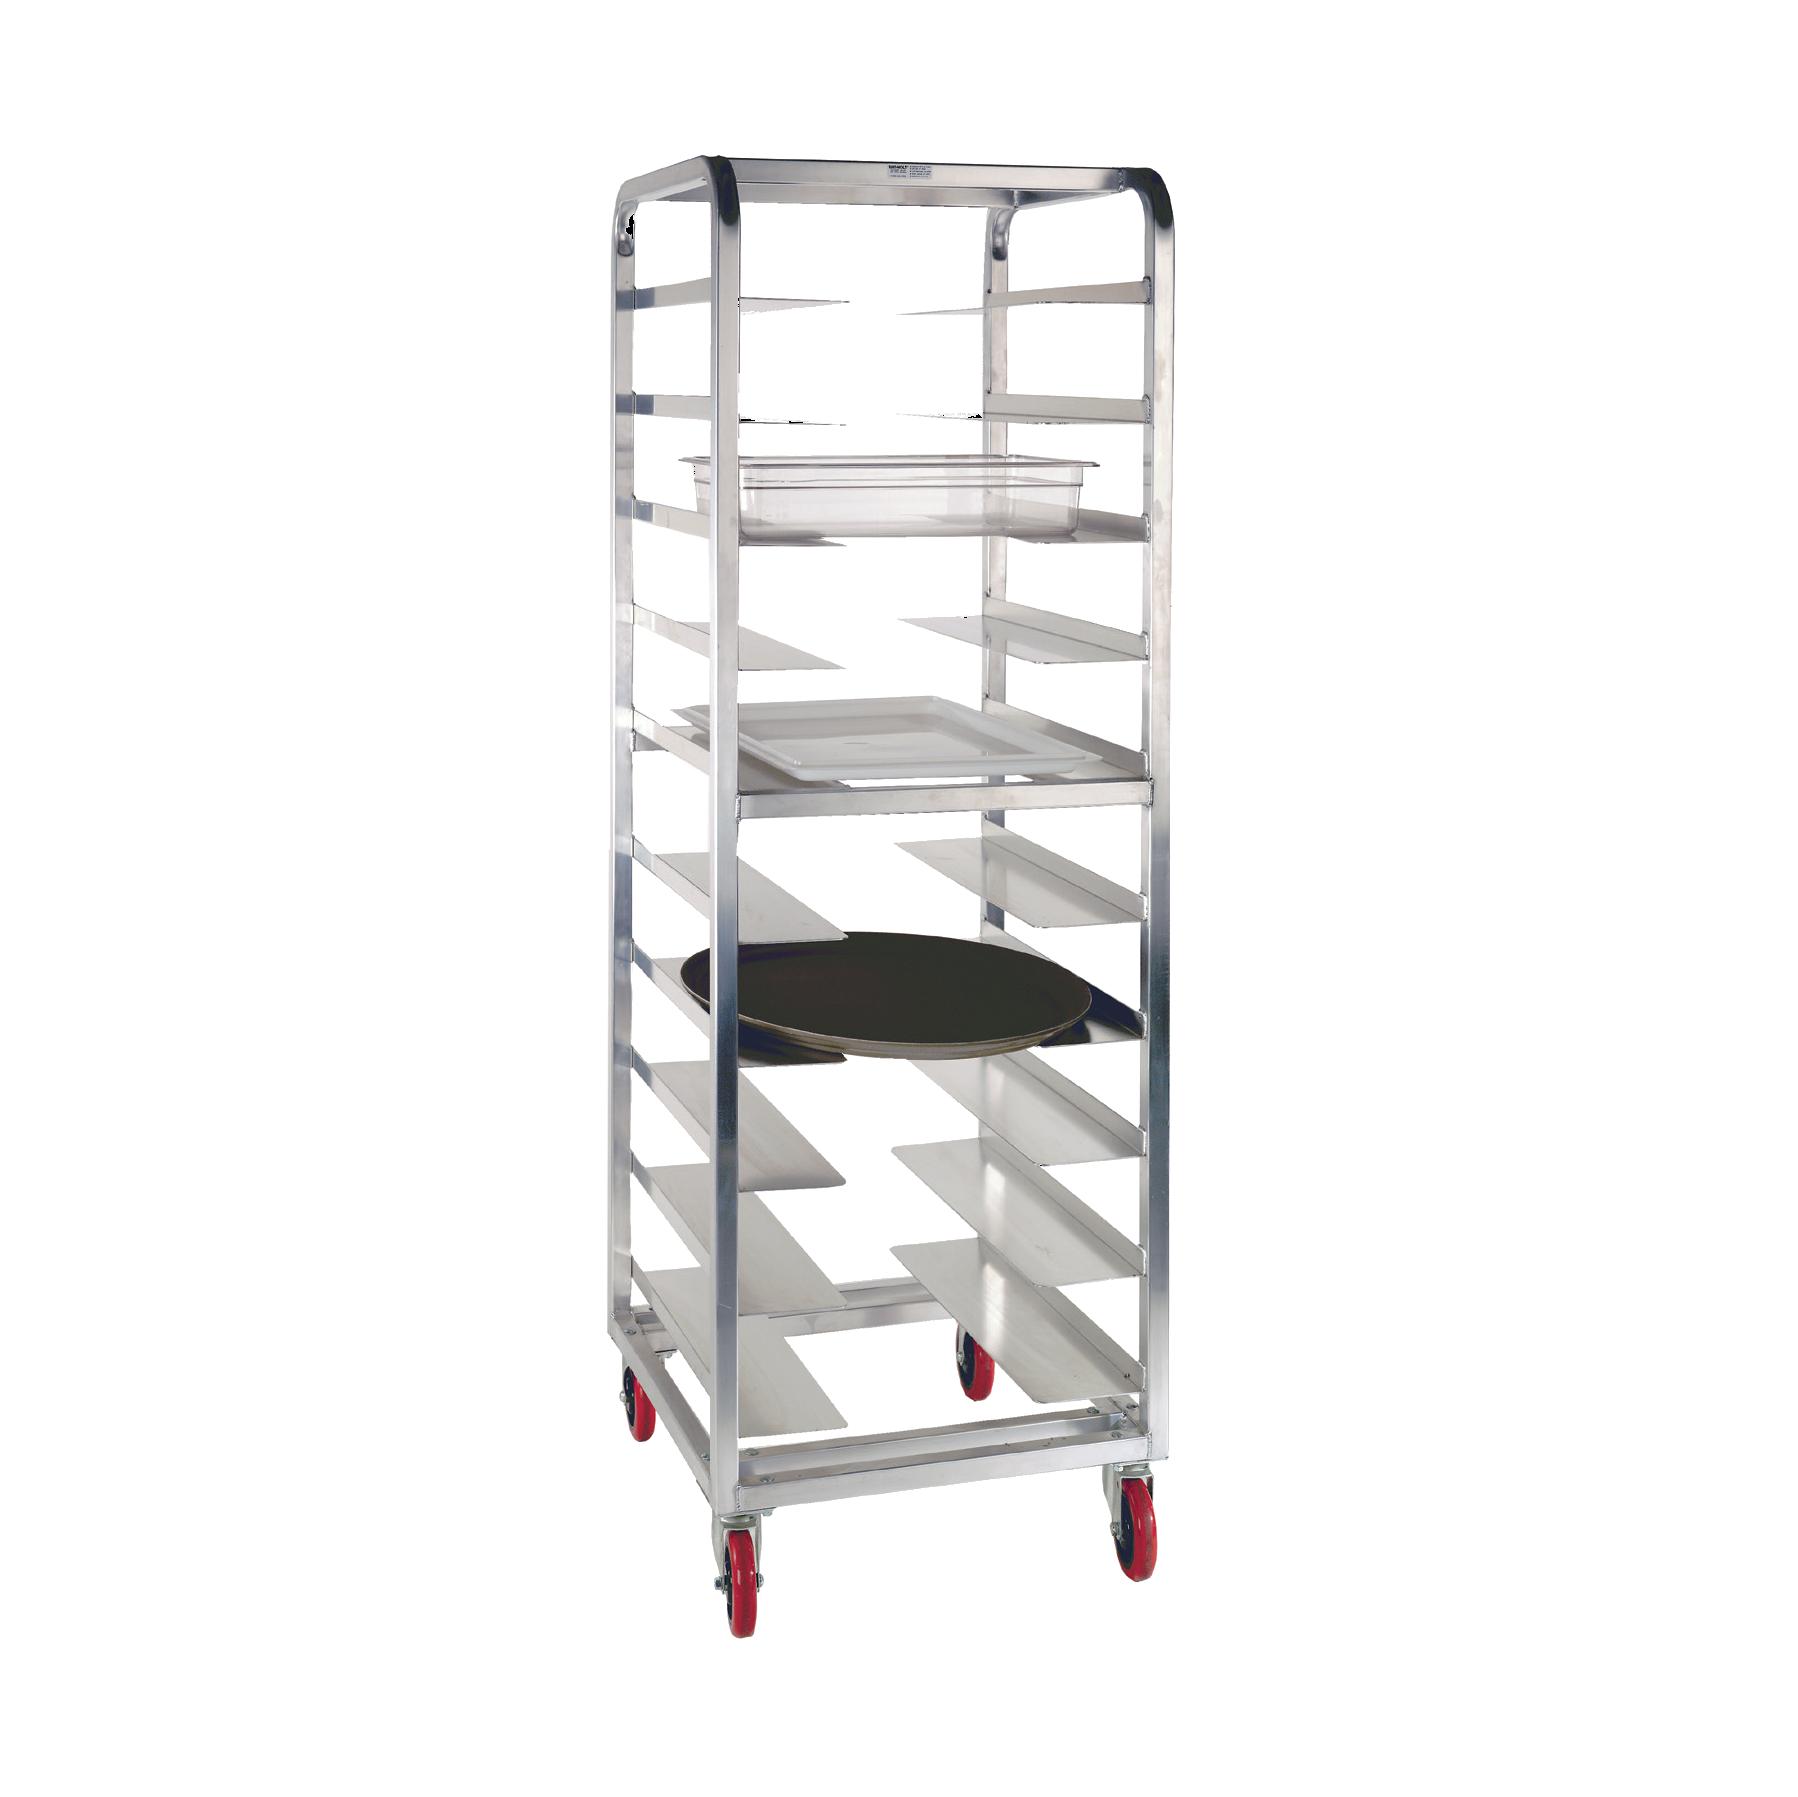 Winholt Equipment UAR-1023 pan rack, universal